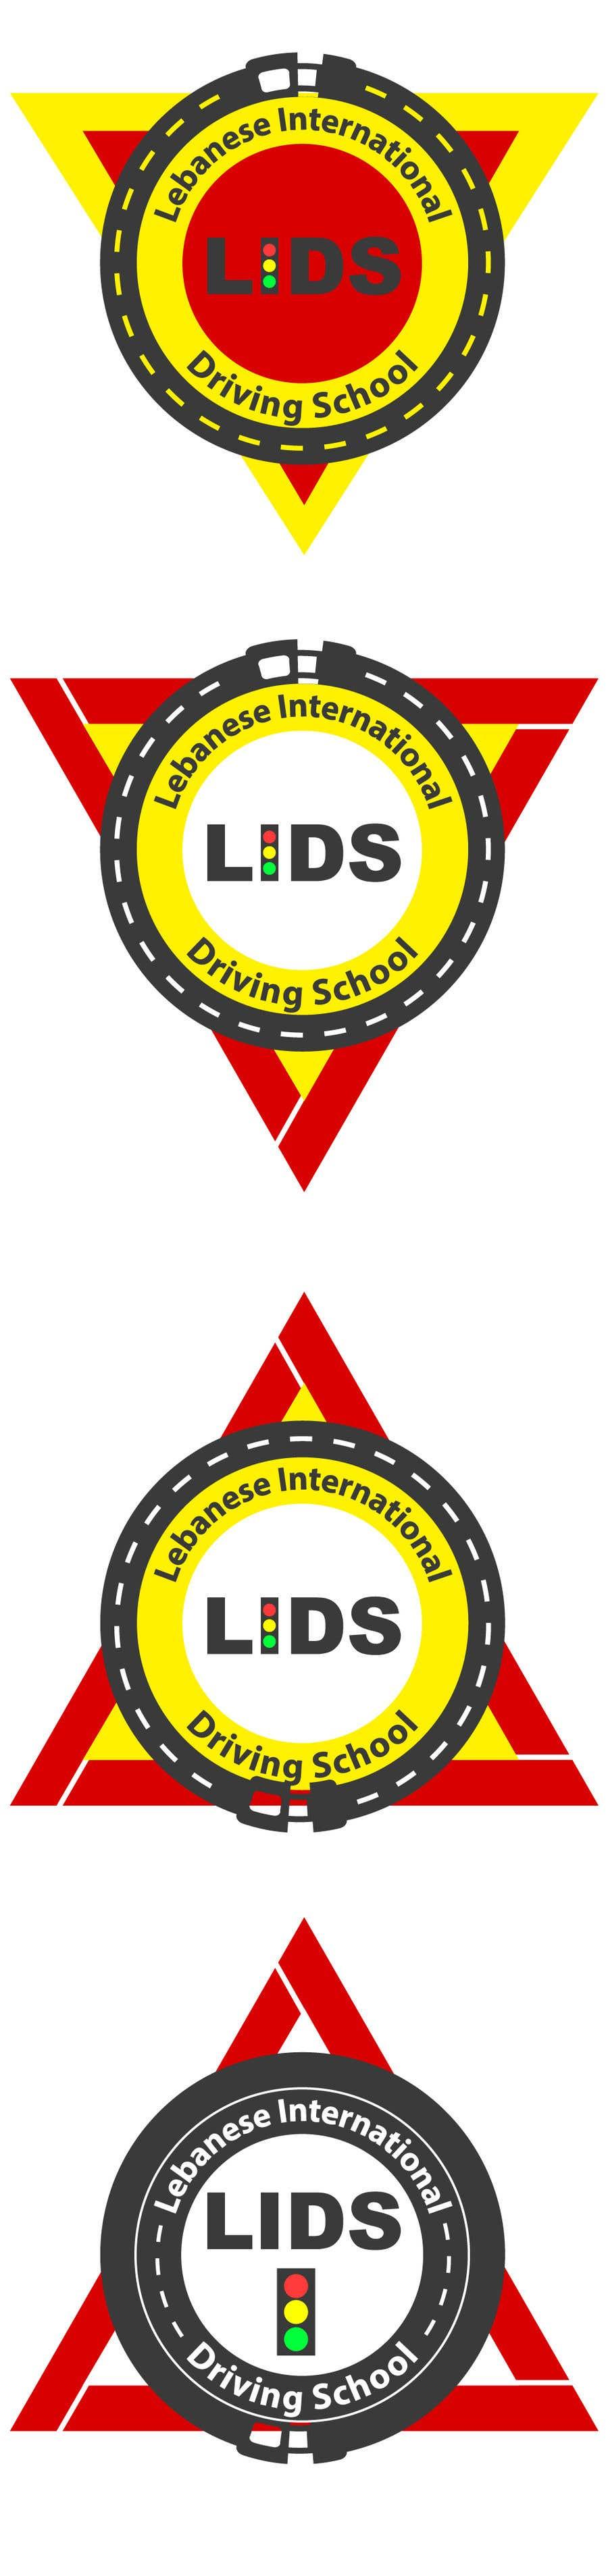 Penyertaan Peraduan #28 untuk Recolor and enhance a driving school logo